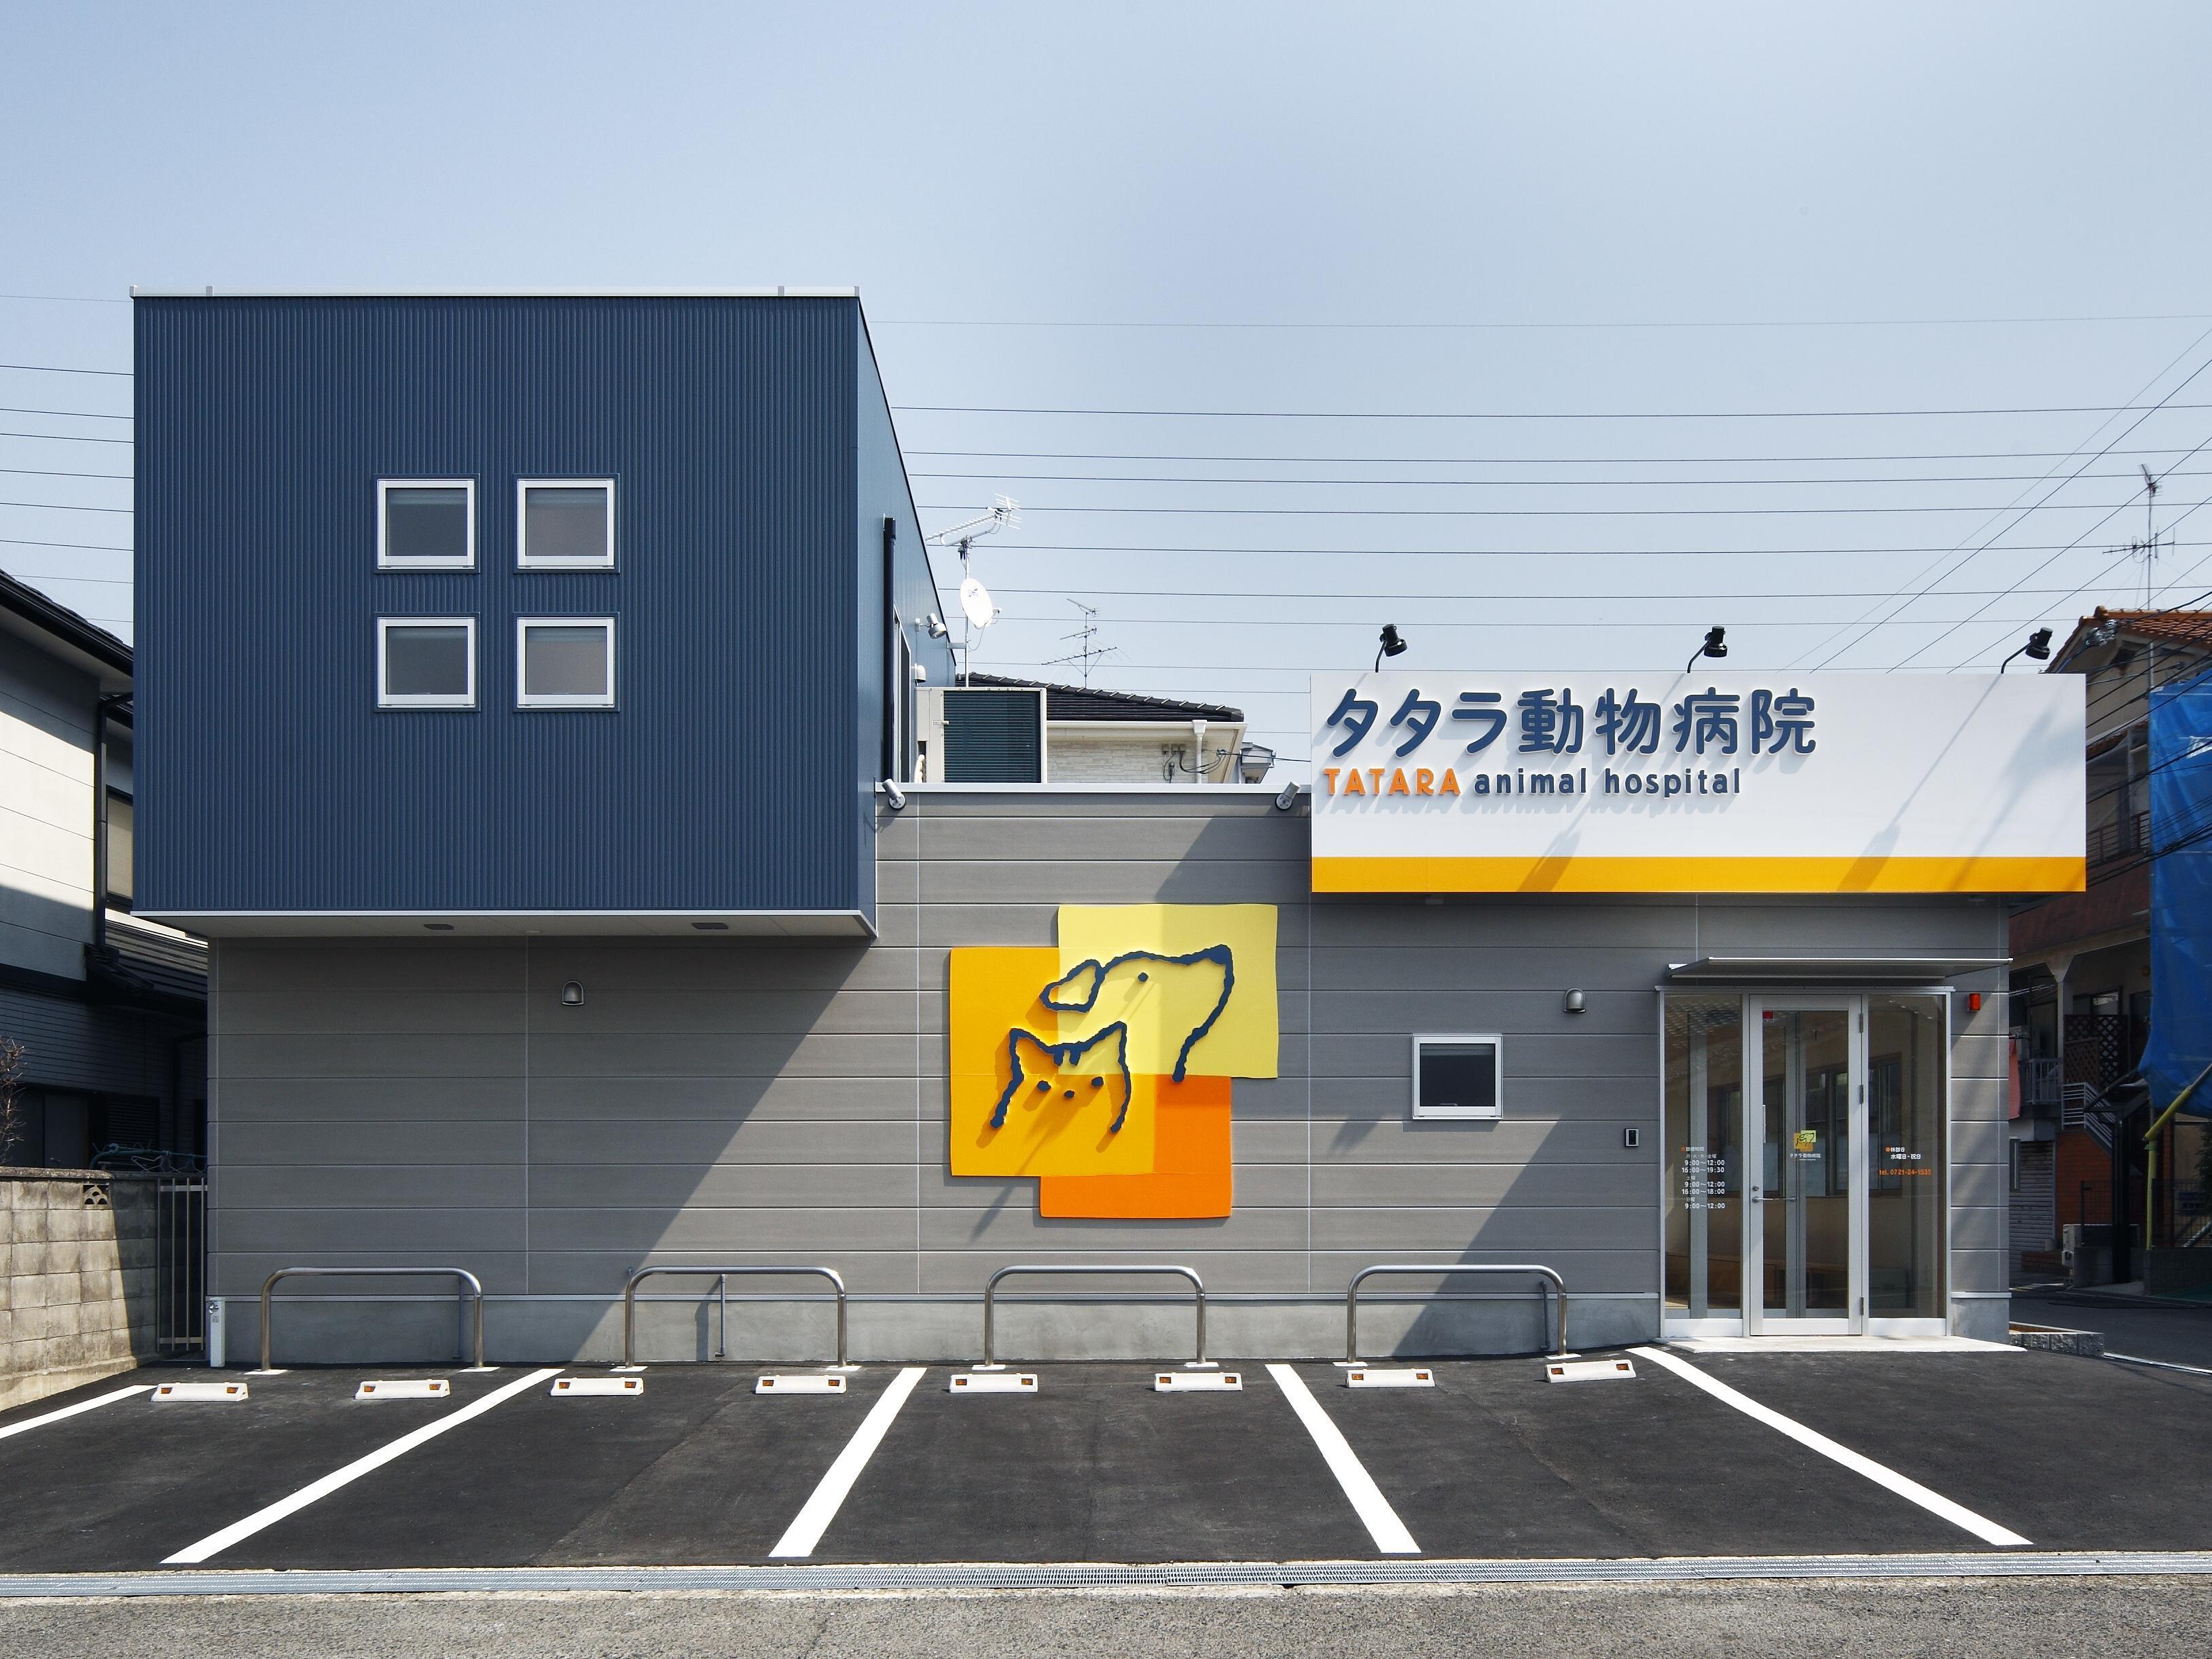 大阪府富田林市 タタラ動物病院 動物看護師募集